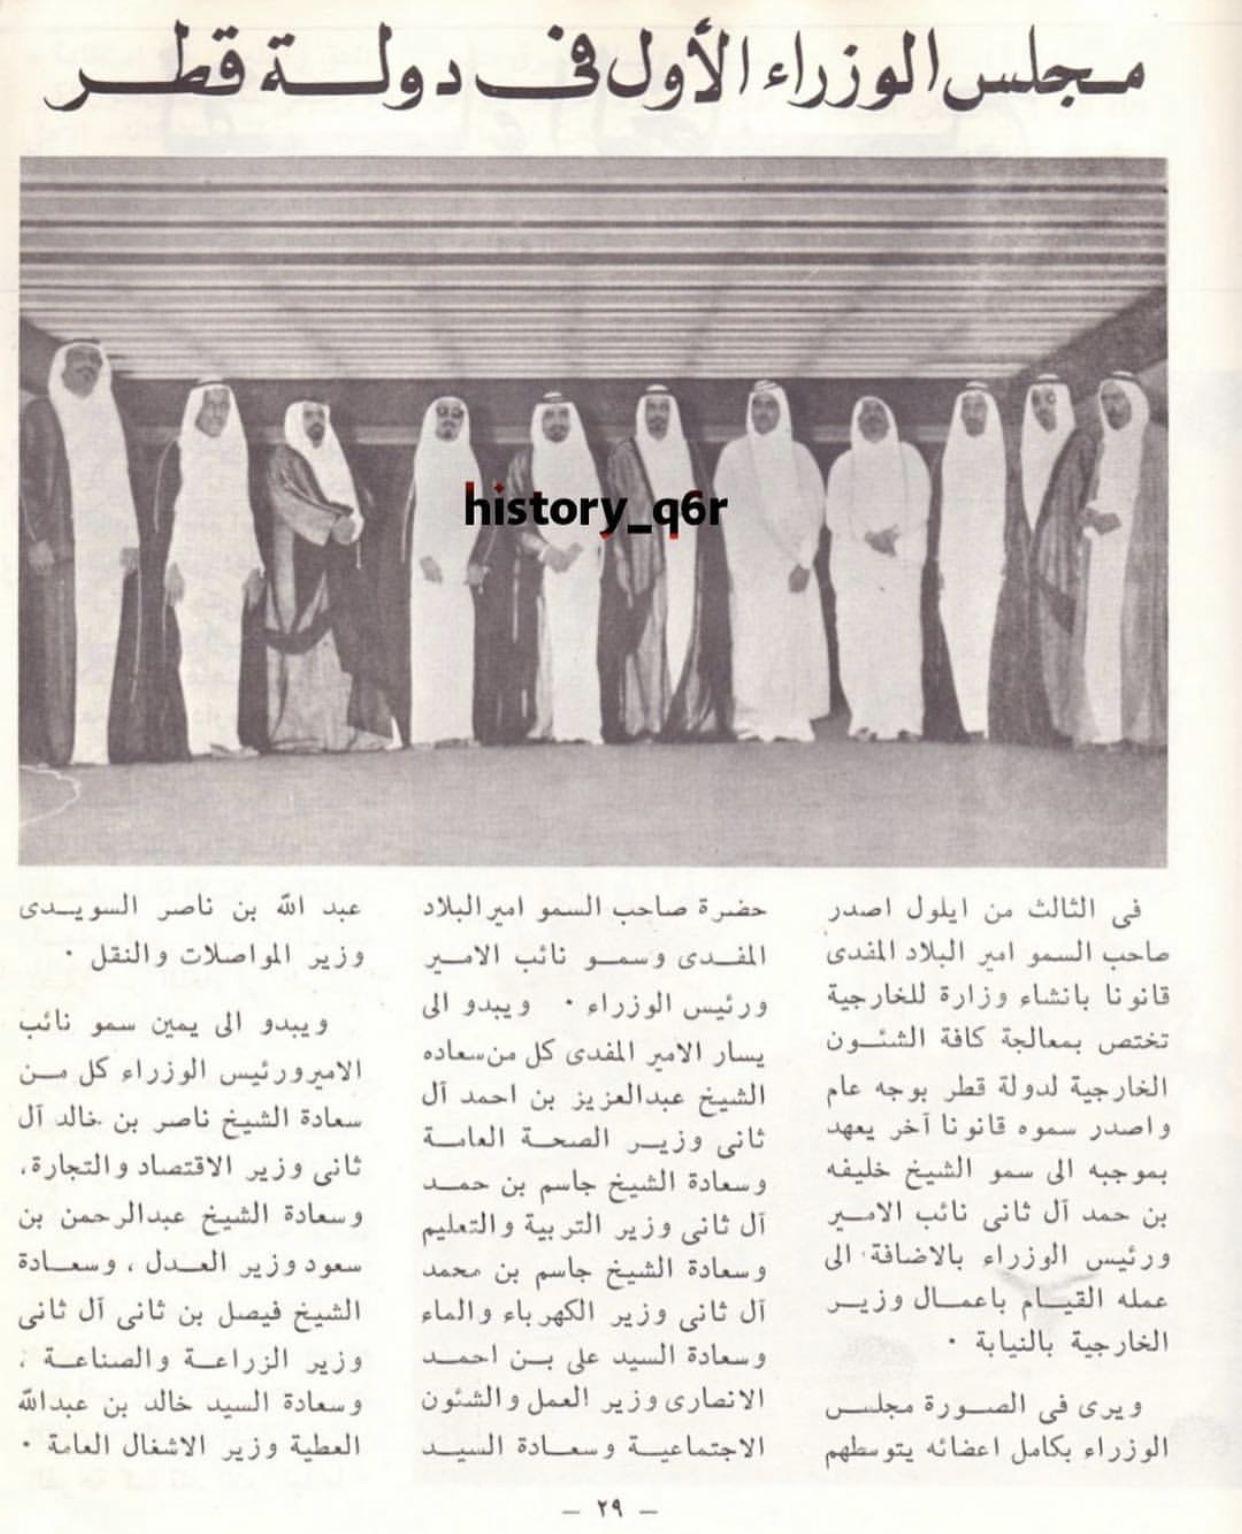 Pin By Ellooloo On Qatar Old Photos Photo Wall Old Photos Photo